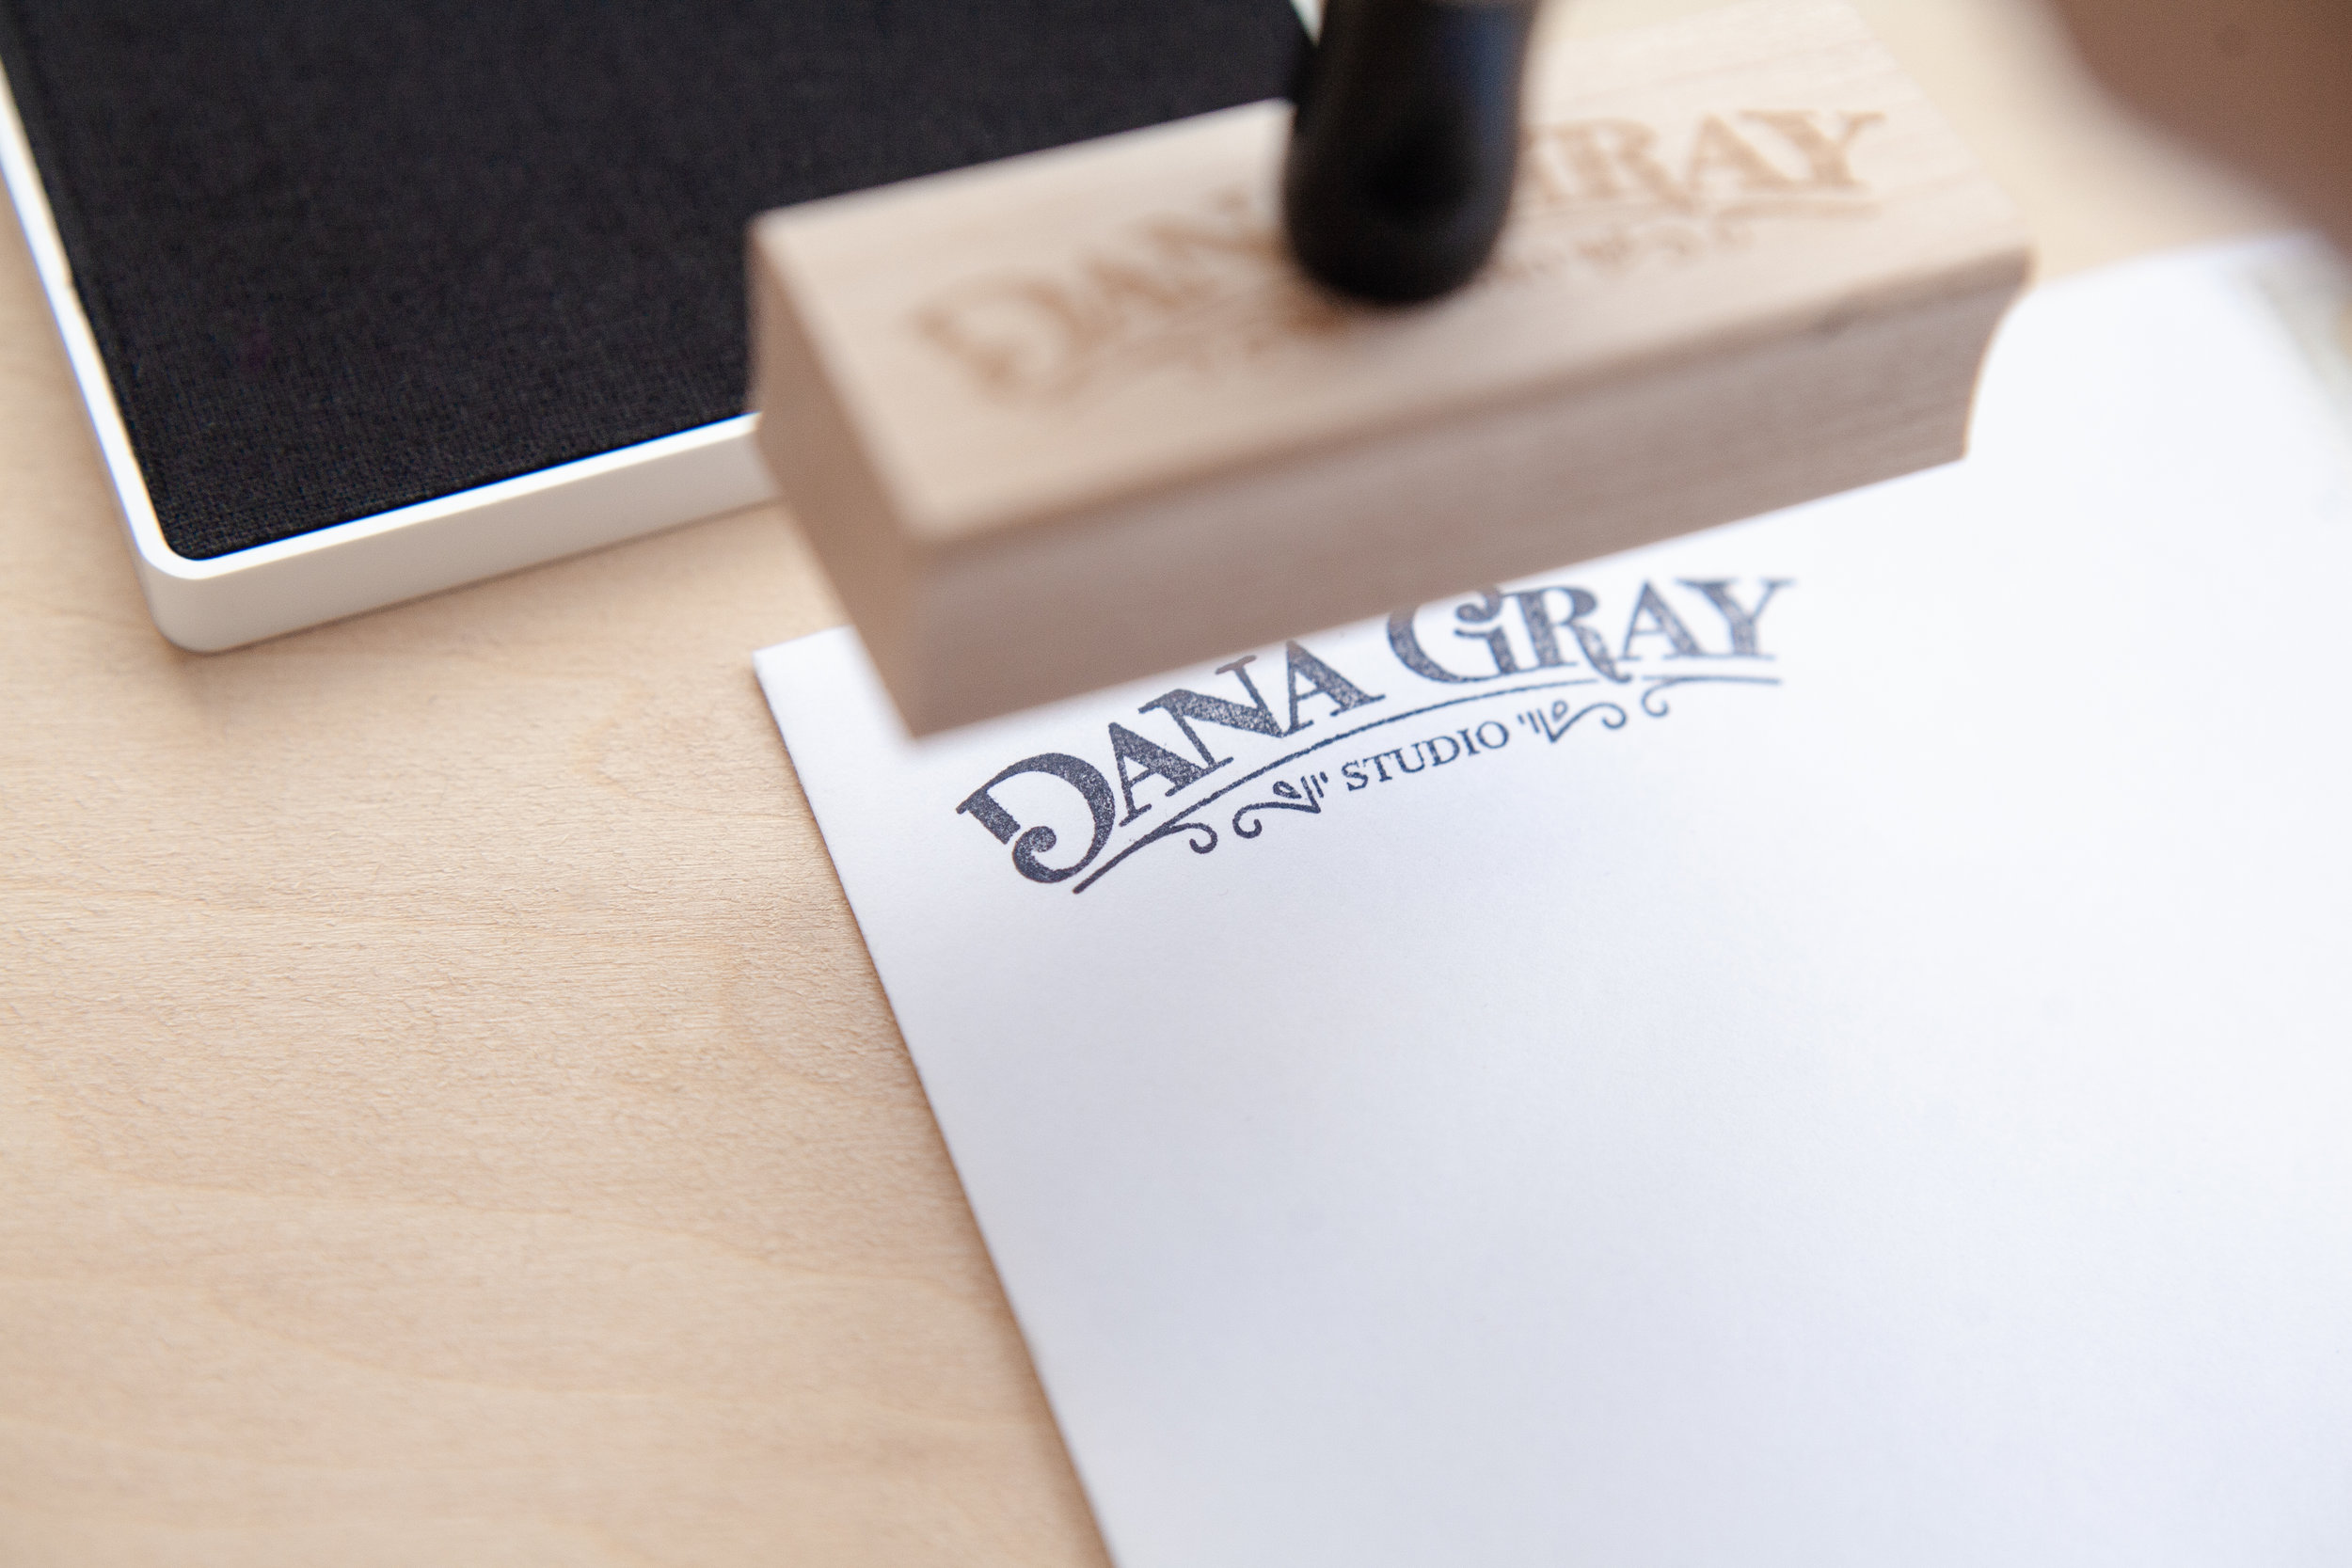 dana_gray_studio_stationery-8.jpg